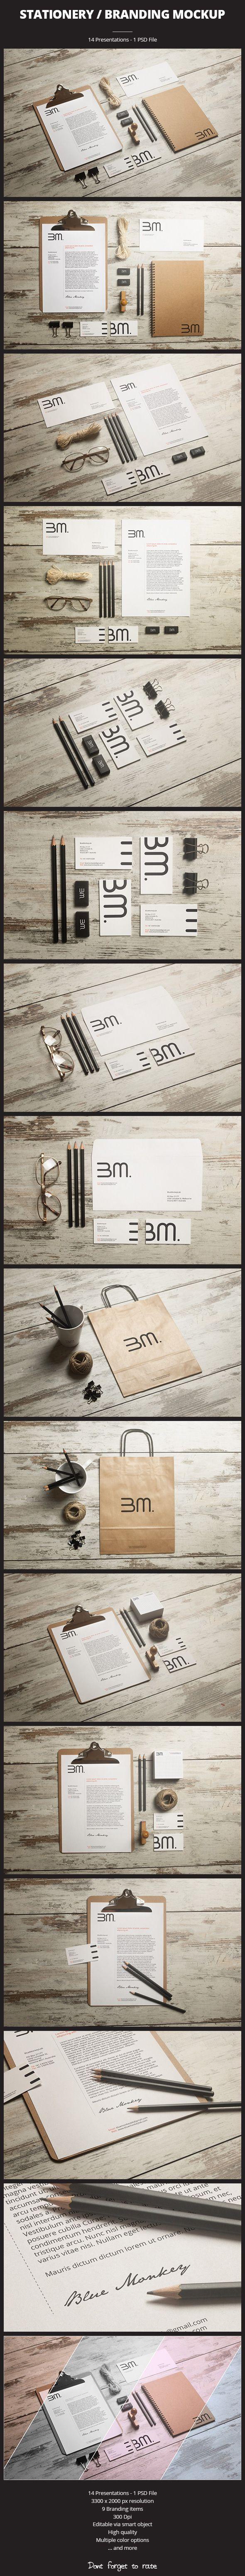 6 poster design photo mockups 57079 - Buy Stationery Branding Mockup By Bluemonkeylab On Graphicriver Stationery Branding Mockup Photorealistic Clean And Super Easy To Use Stationery